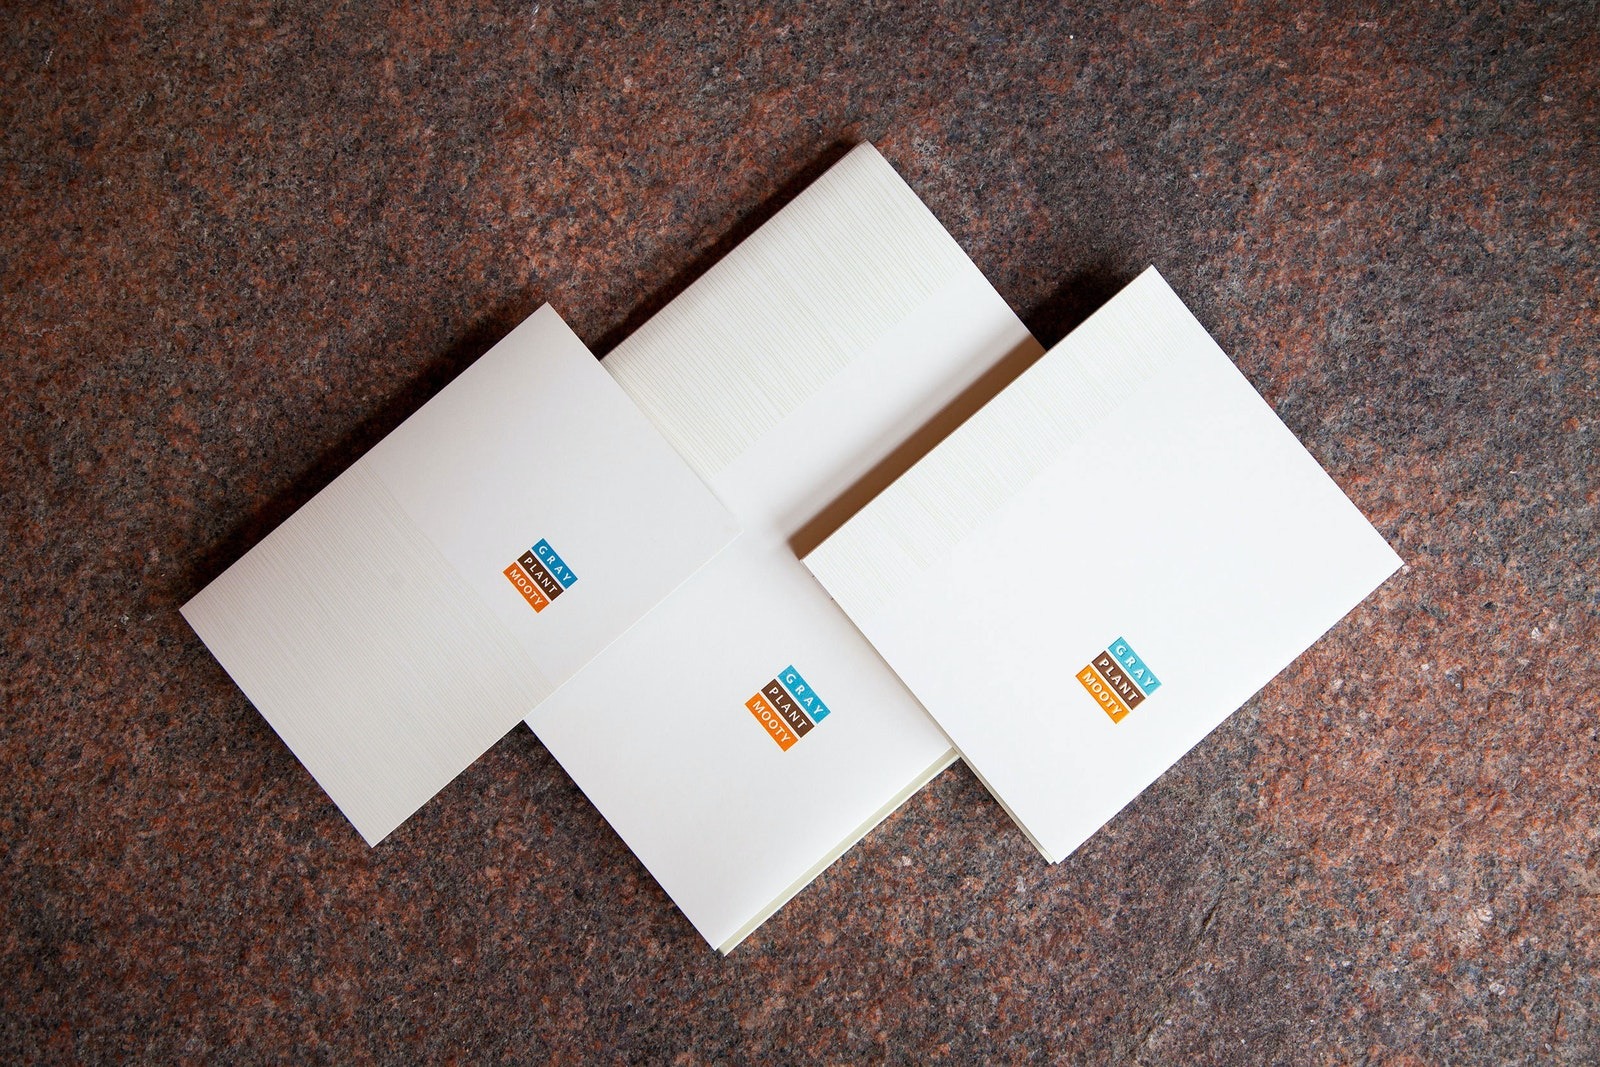 Gray Plant Mooty Folders A